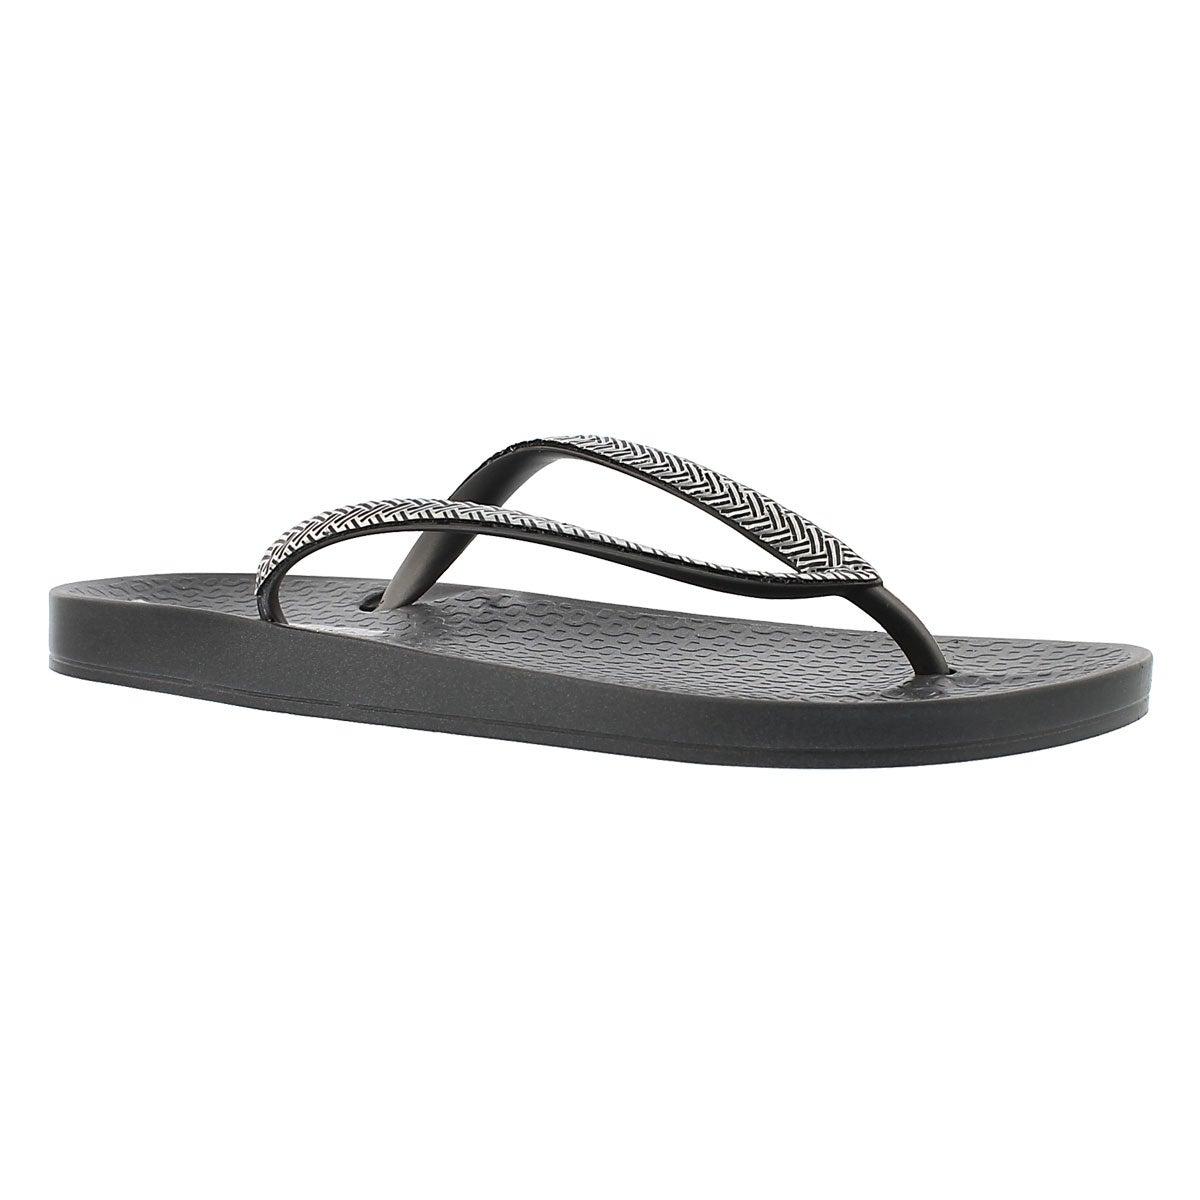 Women's MESH FEM grey/silver flip flops